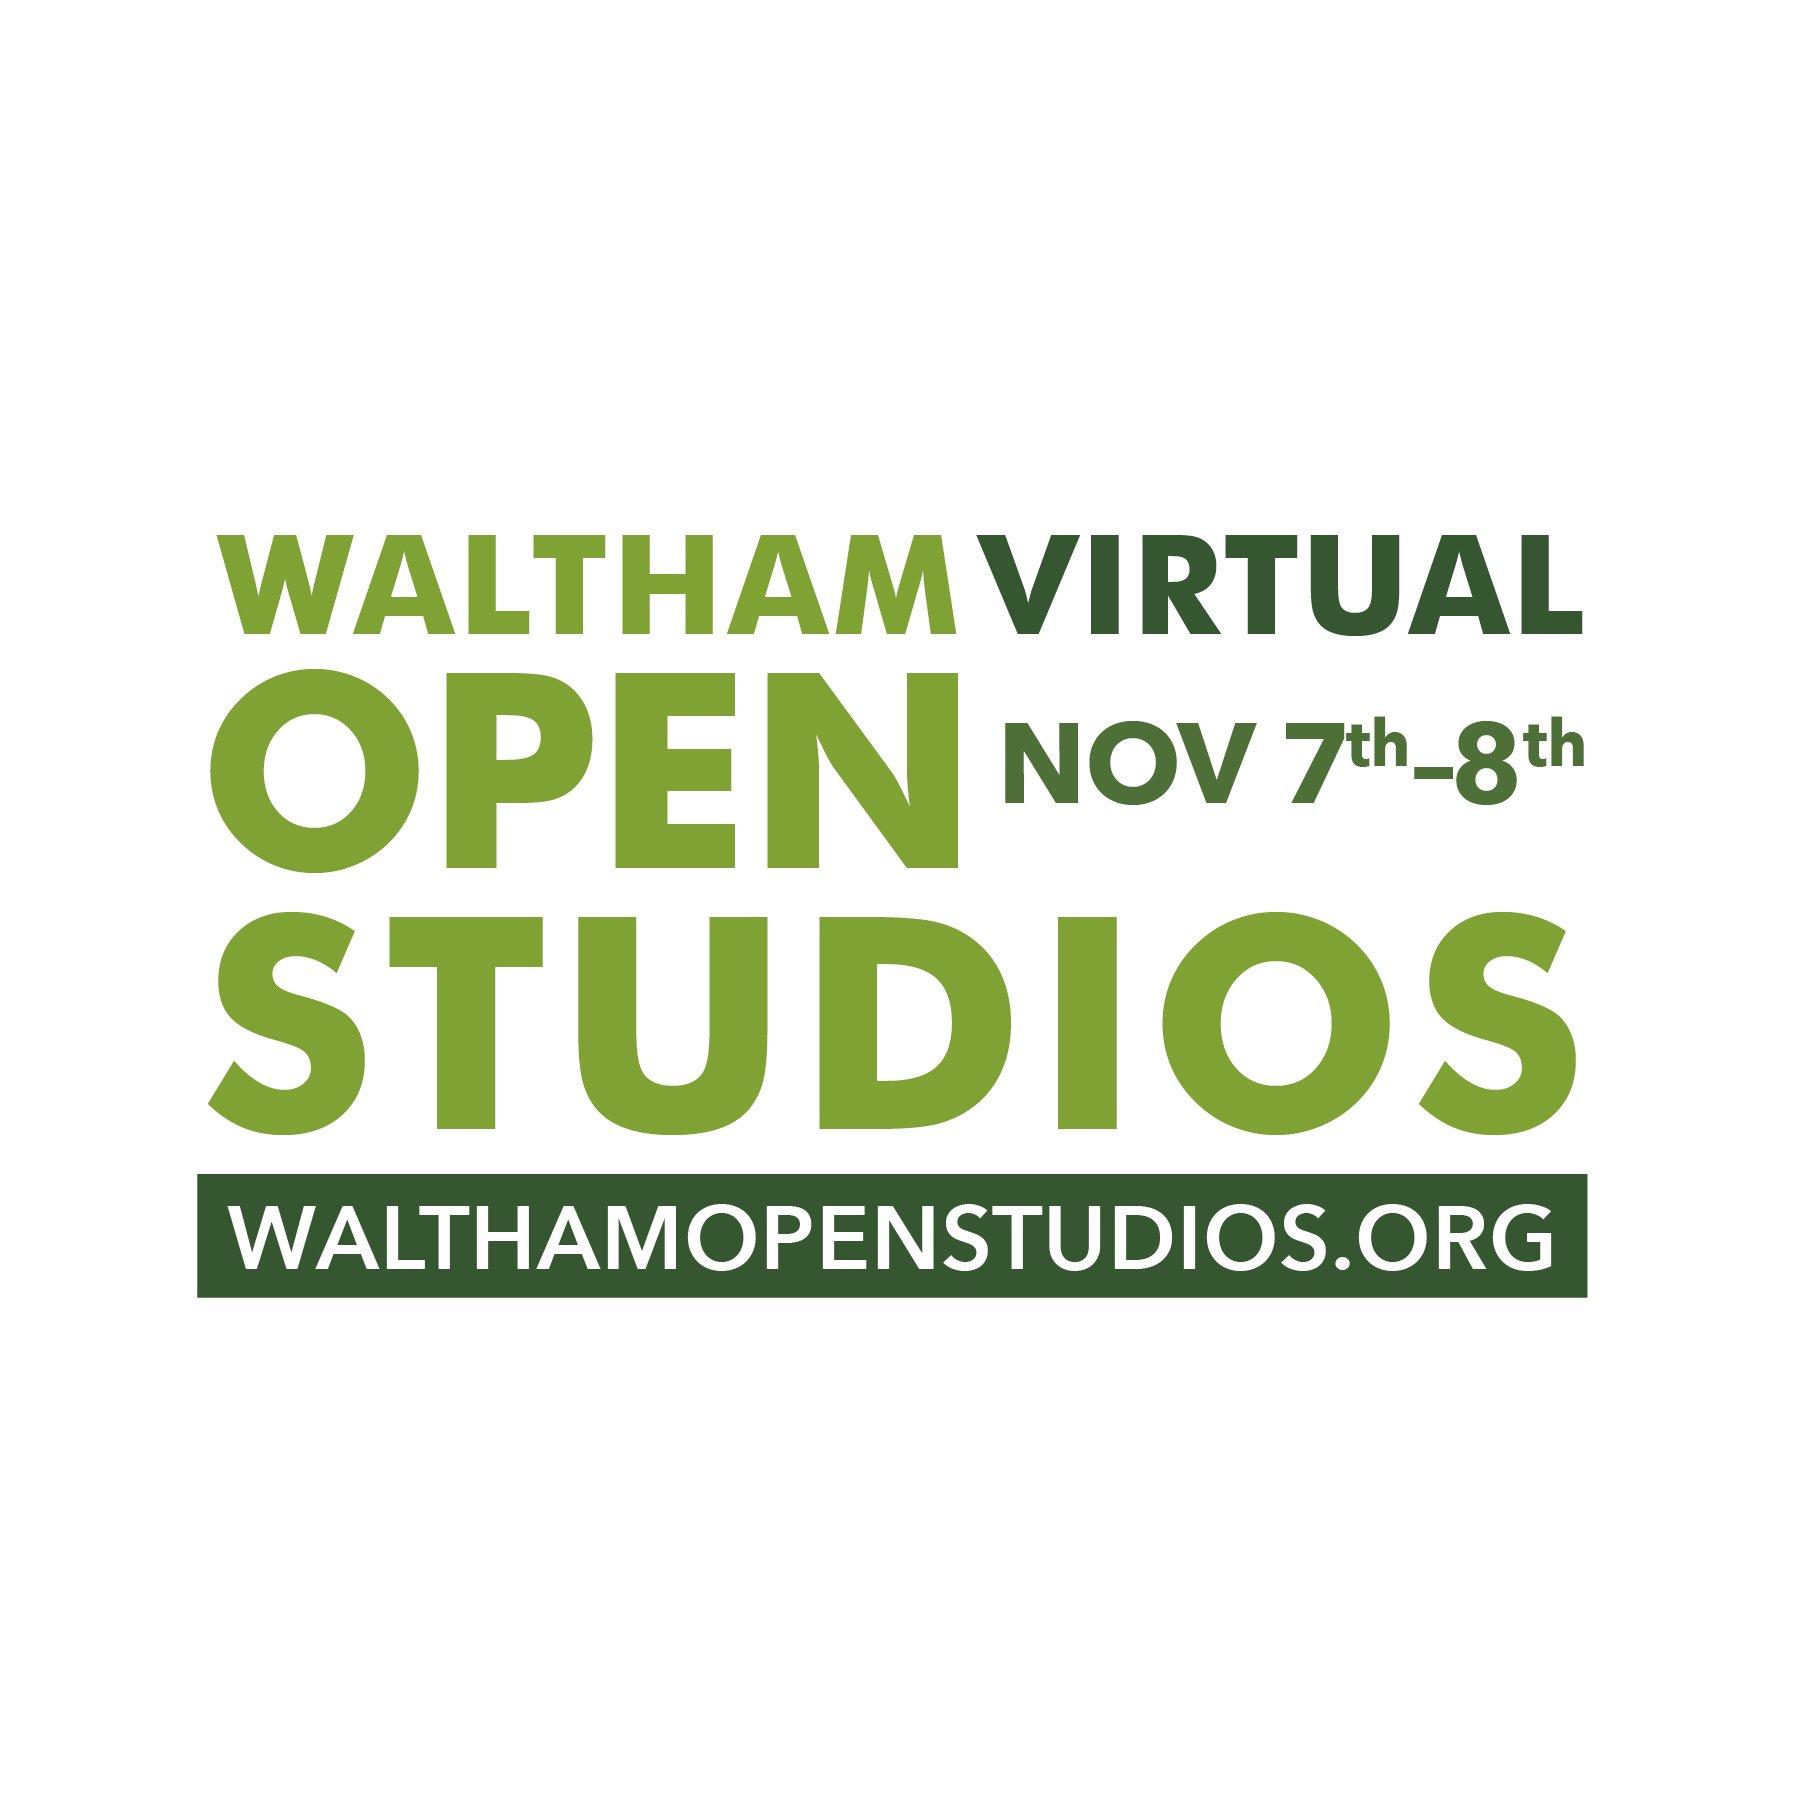 Waltham Open Studios 2020